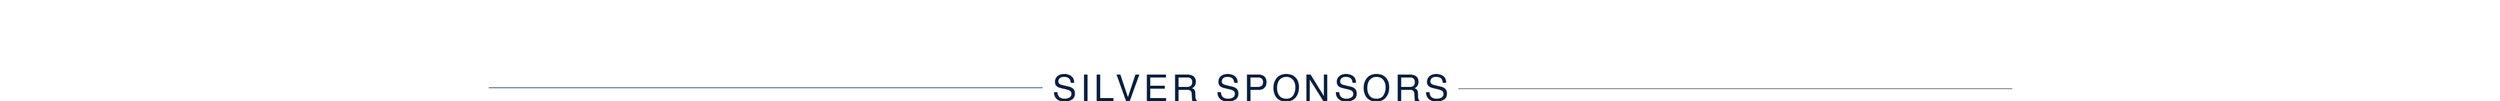 Silver Sponsors (1).jpg